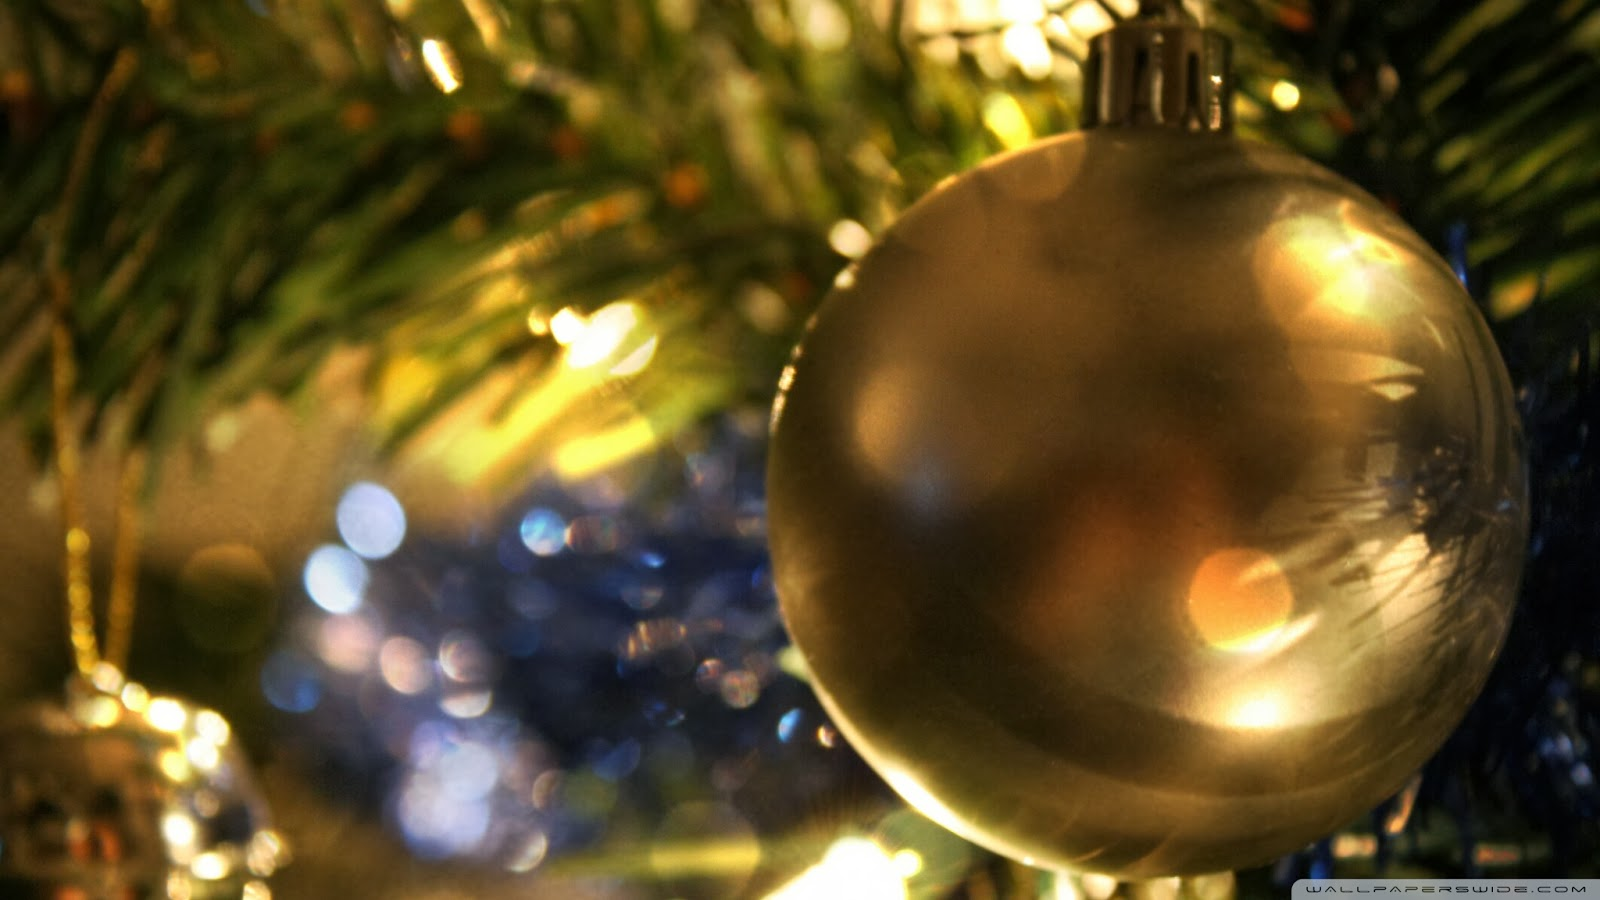 Elegant Christmas Background: 50 Elegant HD Wallpapers Of Christmas For Mobile & Desktop